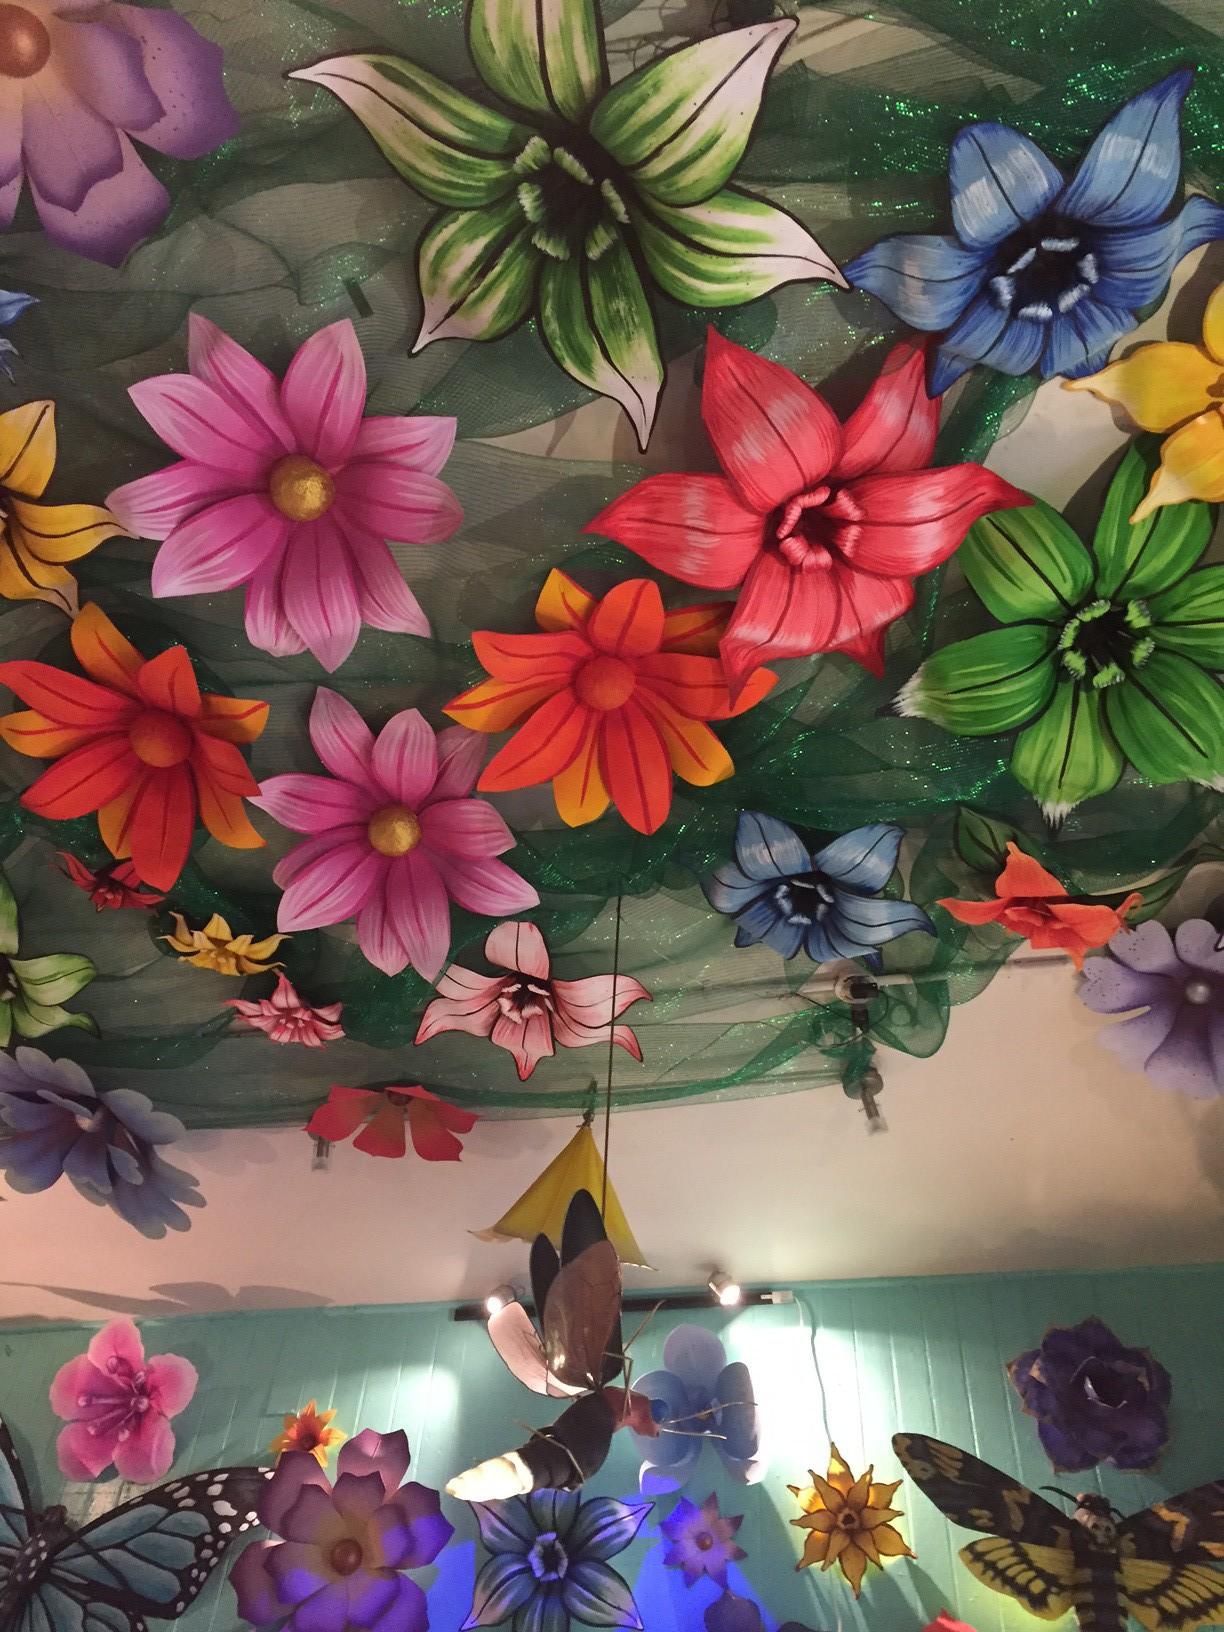 Isn't This Ceiling Amazing?